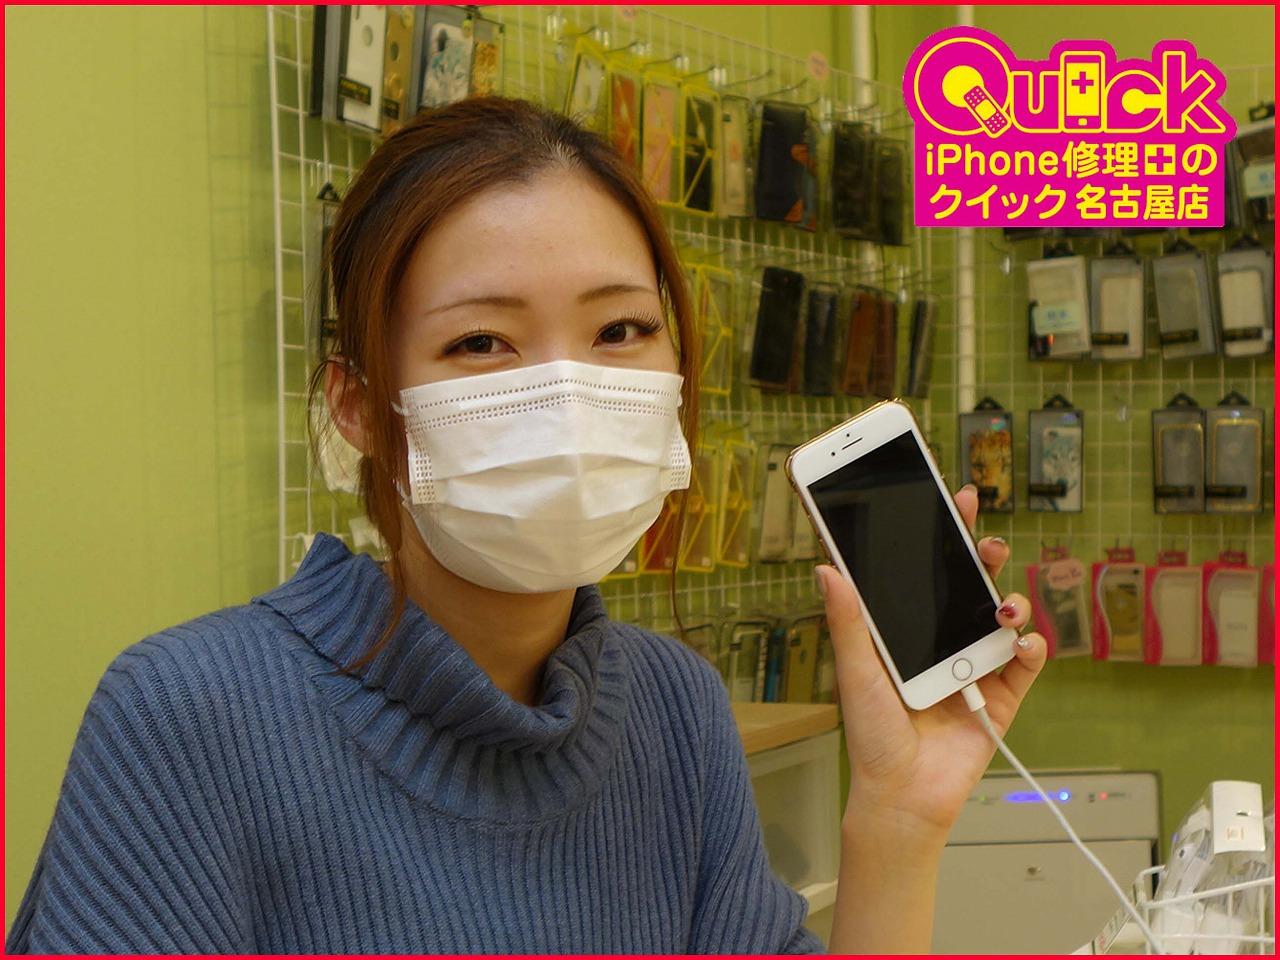 ☆iPhone8の液晶交換修理に名古屋市内よりご来店!アイフォン修理のクイック名古屋